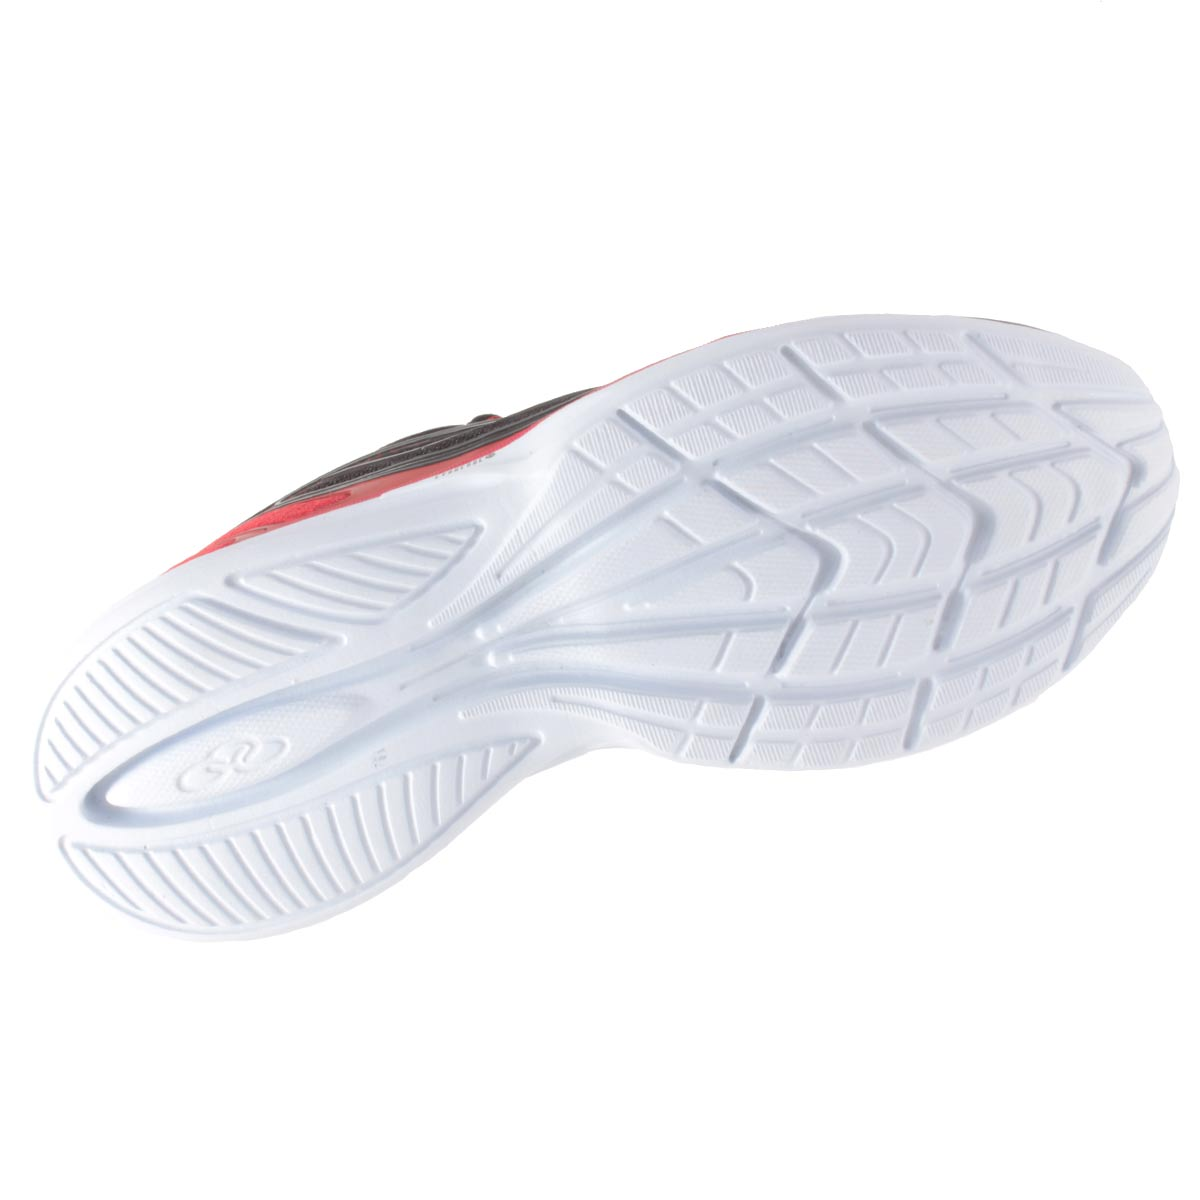 Tênis Olympikus Starter Masculino Caminhada Corrida Leve 341